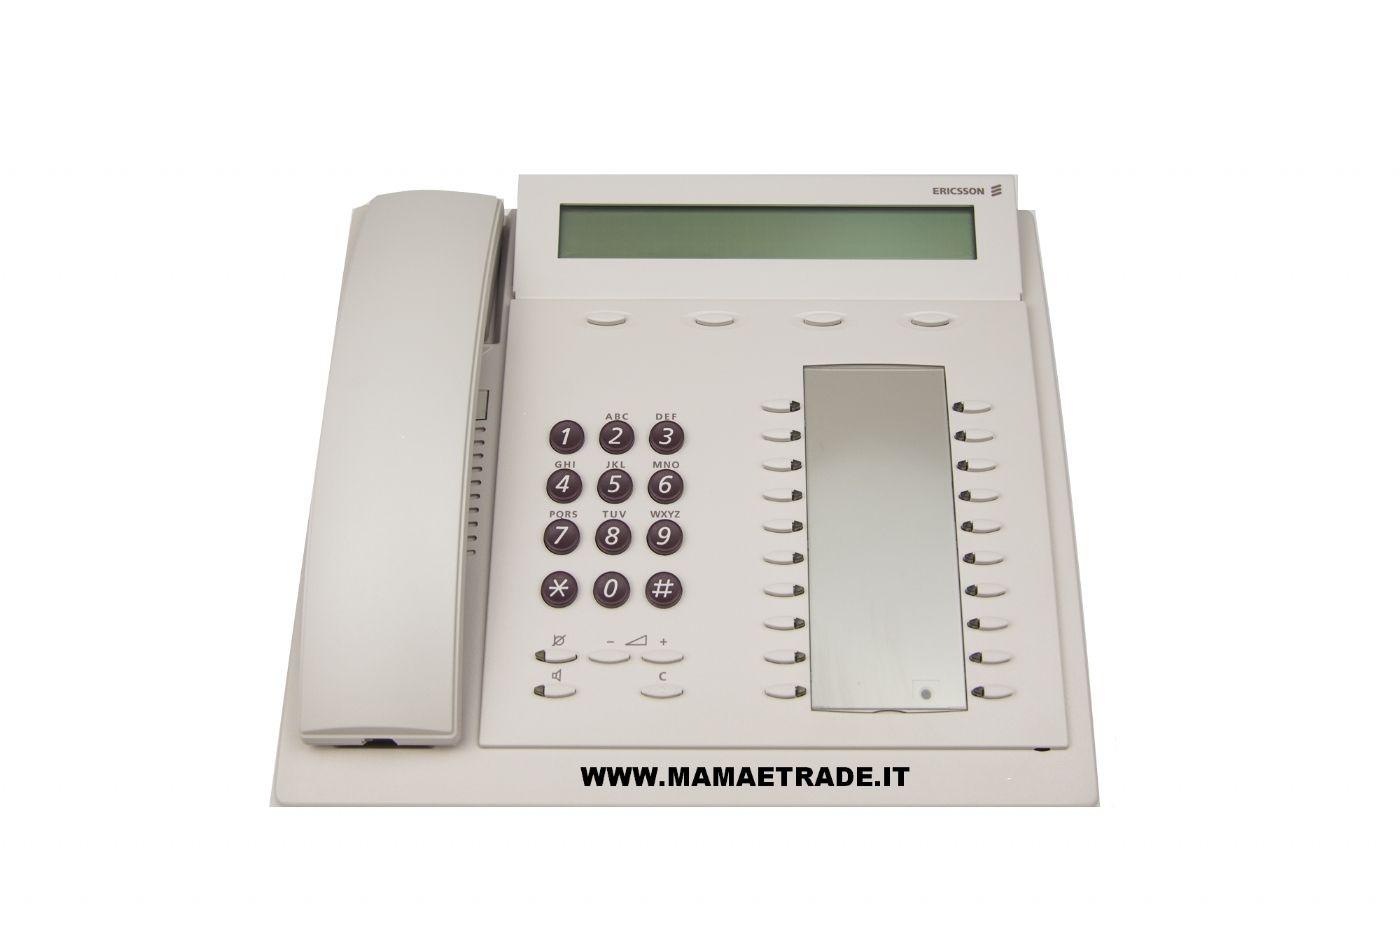 Ericsson dby 409